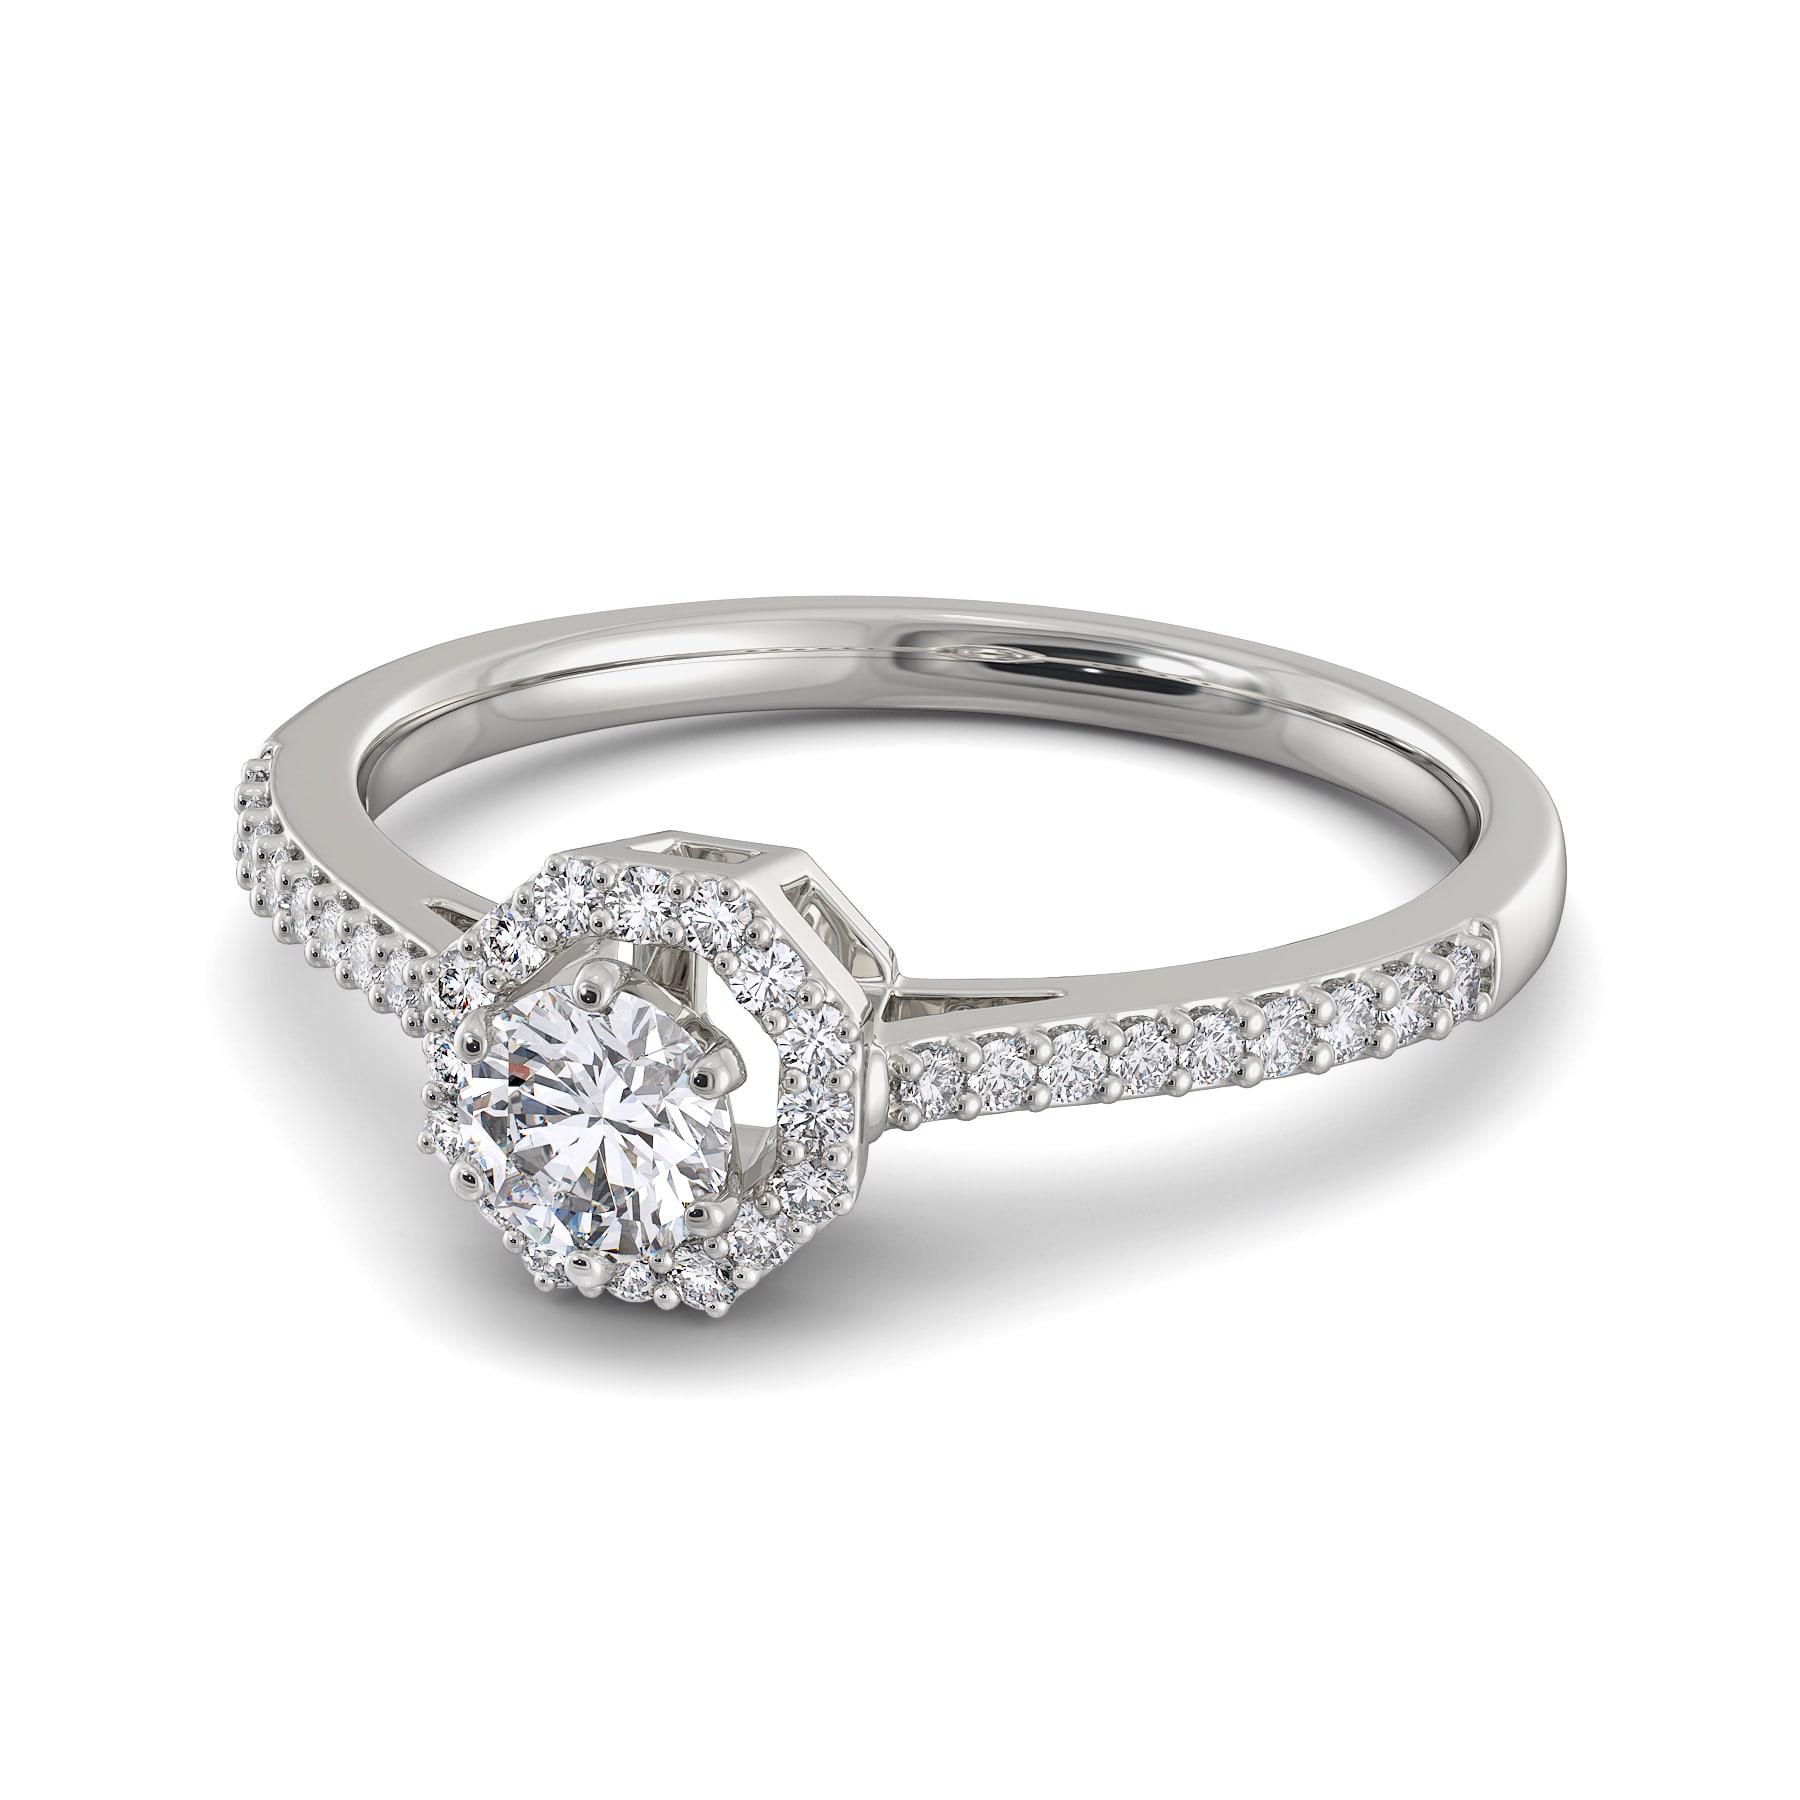 Buy Sparkle Suave Diamond Rings @ Melorra.com